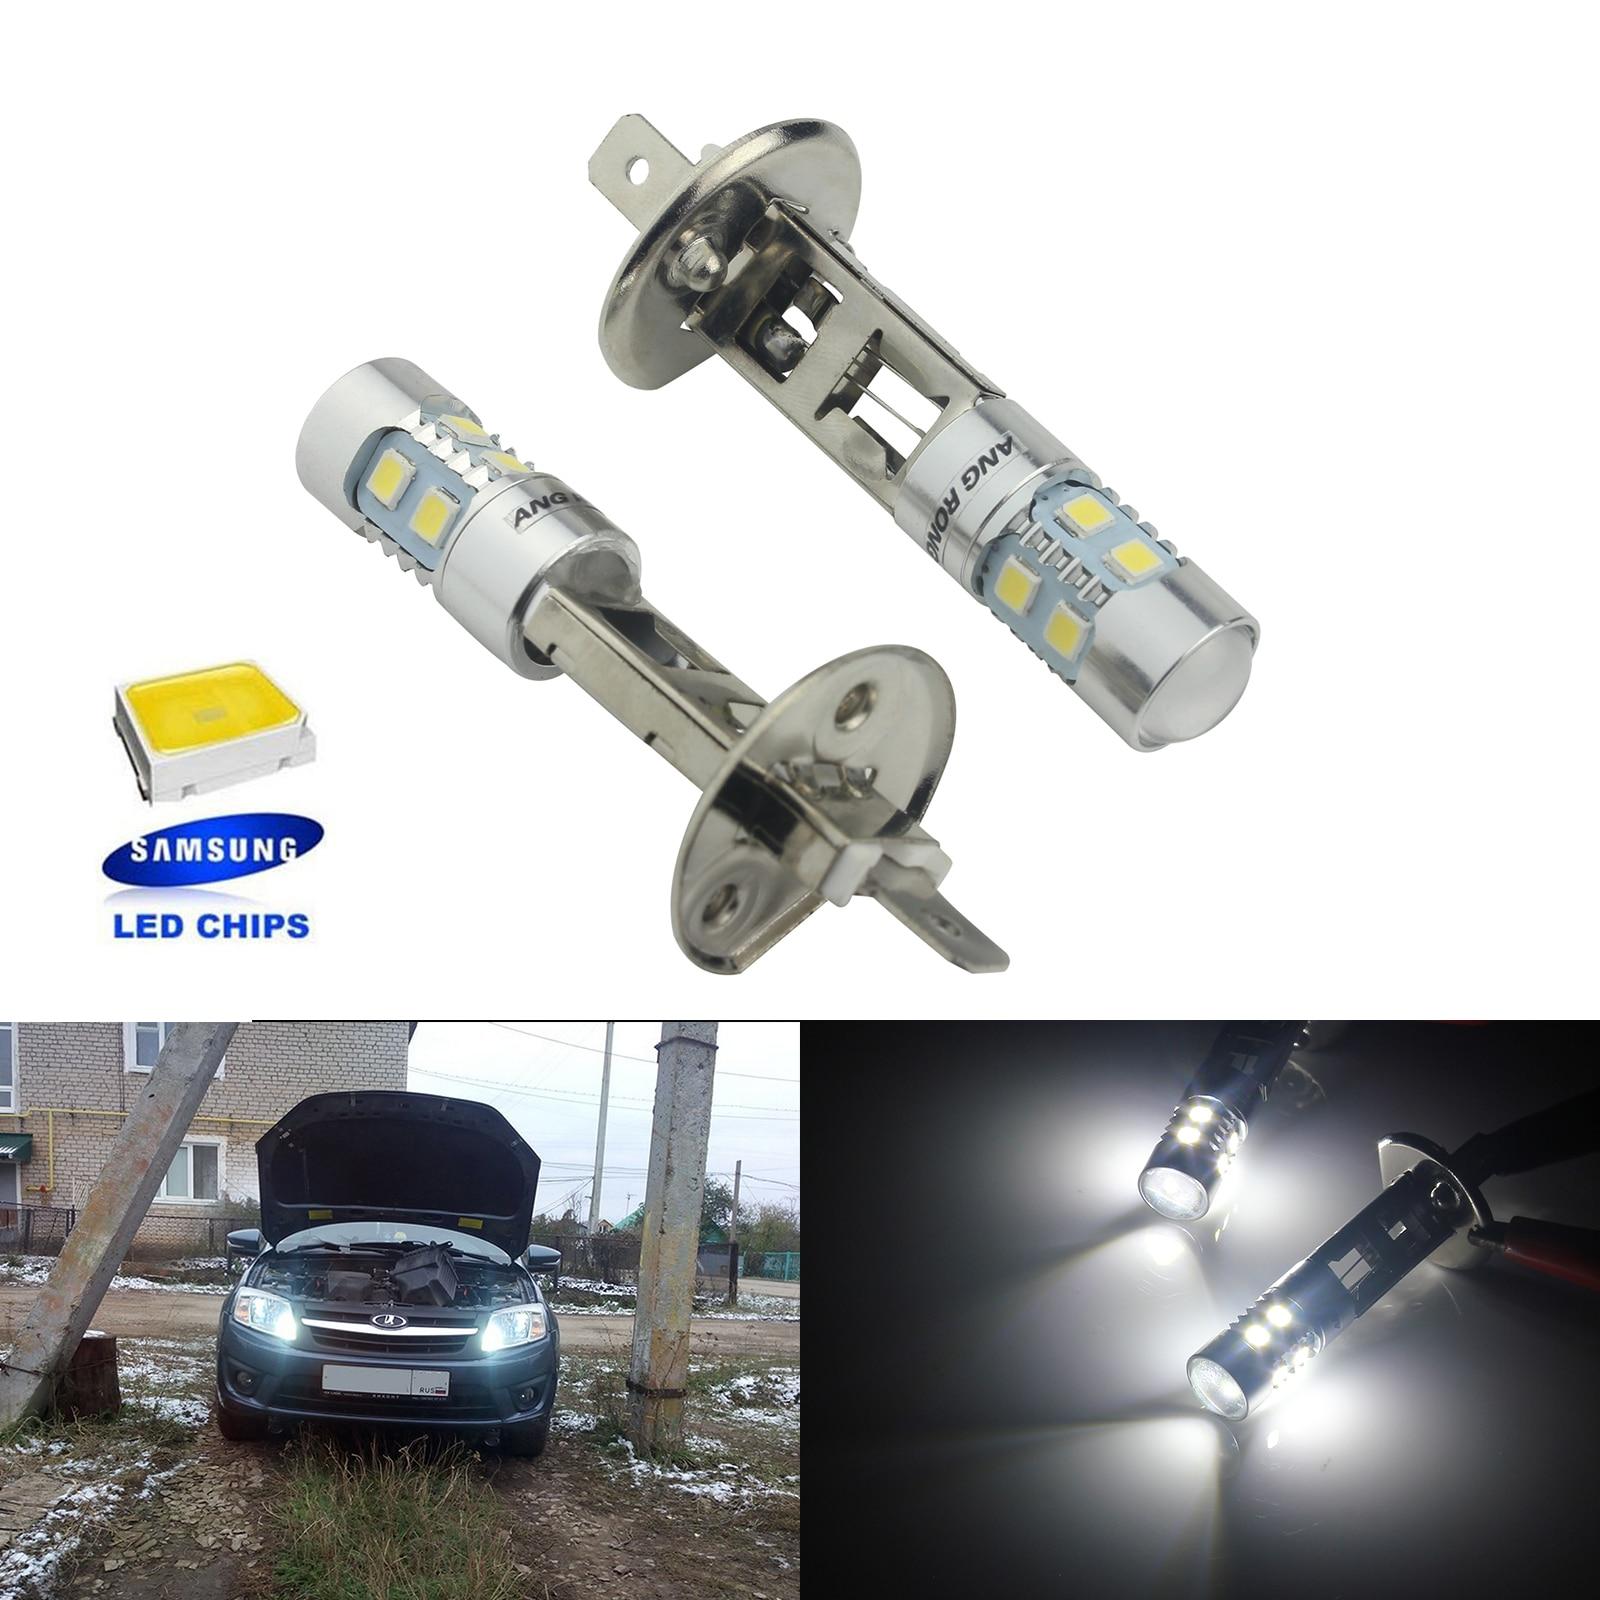 Lucas H1 Single Headlamp Bulb 448 Standard Replacement Head Light Car Bulb